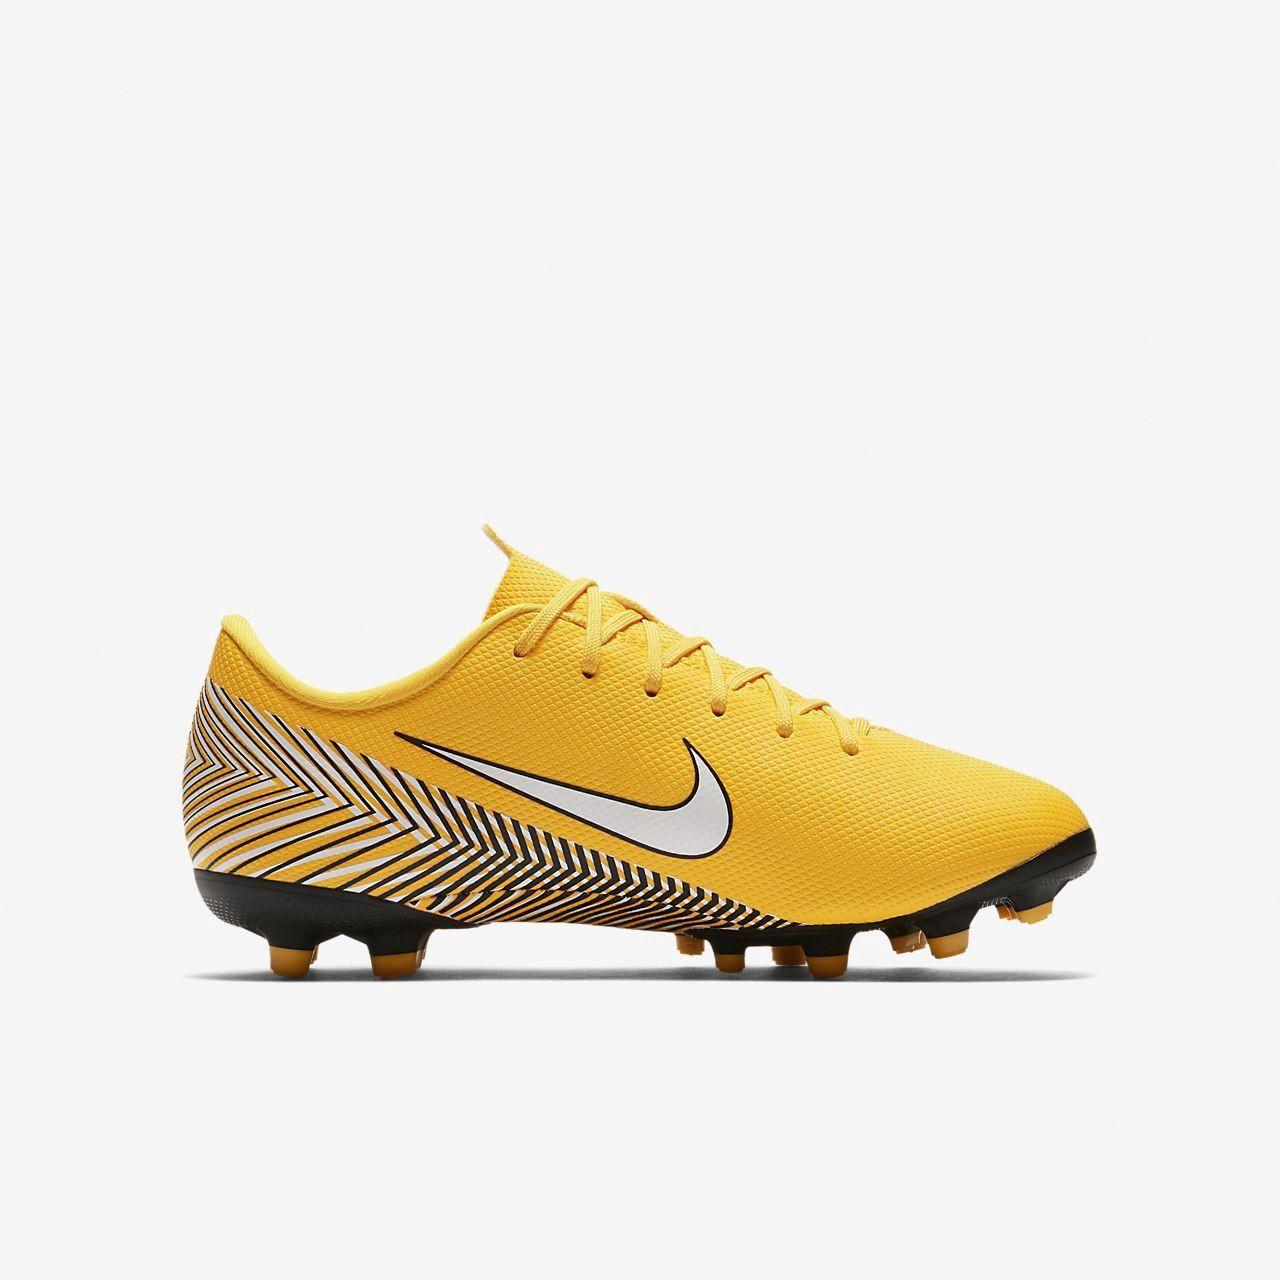 New York chaussures classiques chaussures junior nike neymar